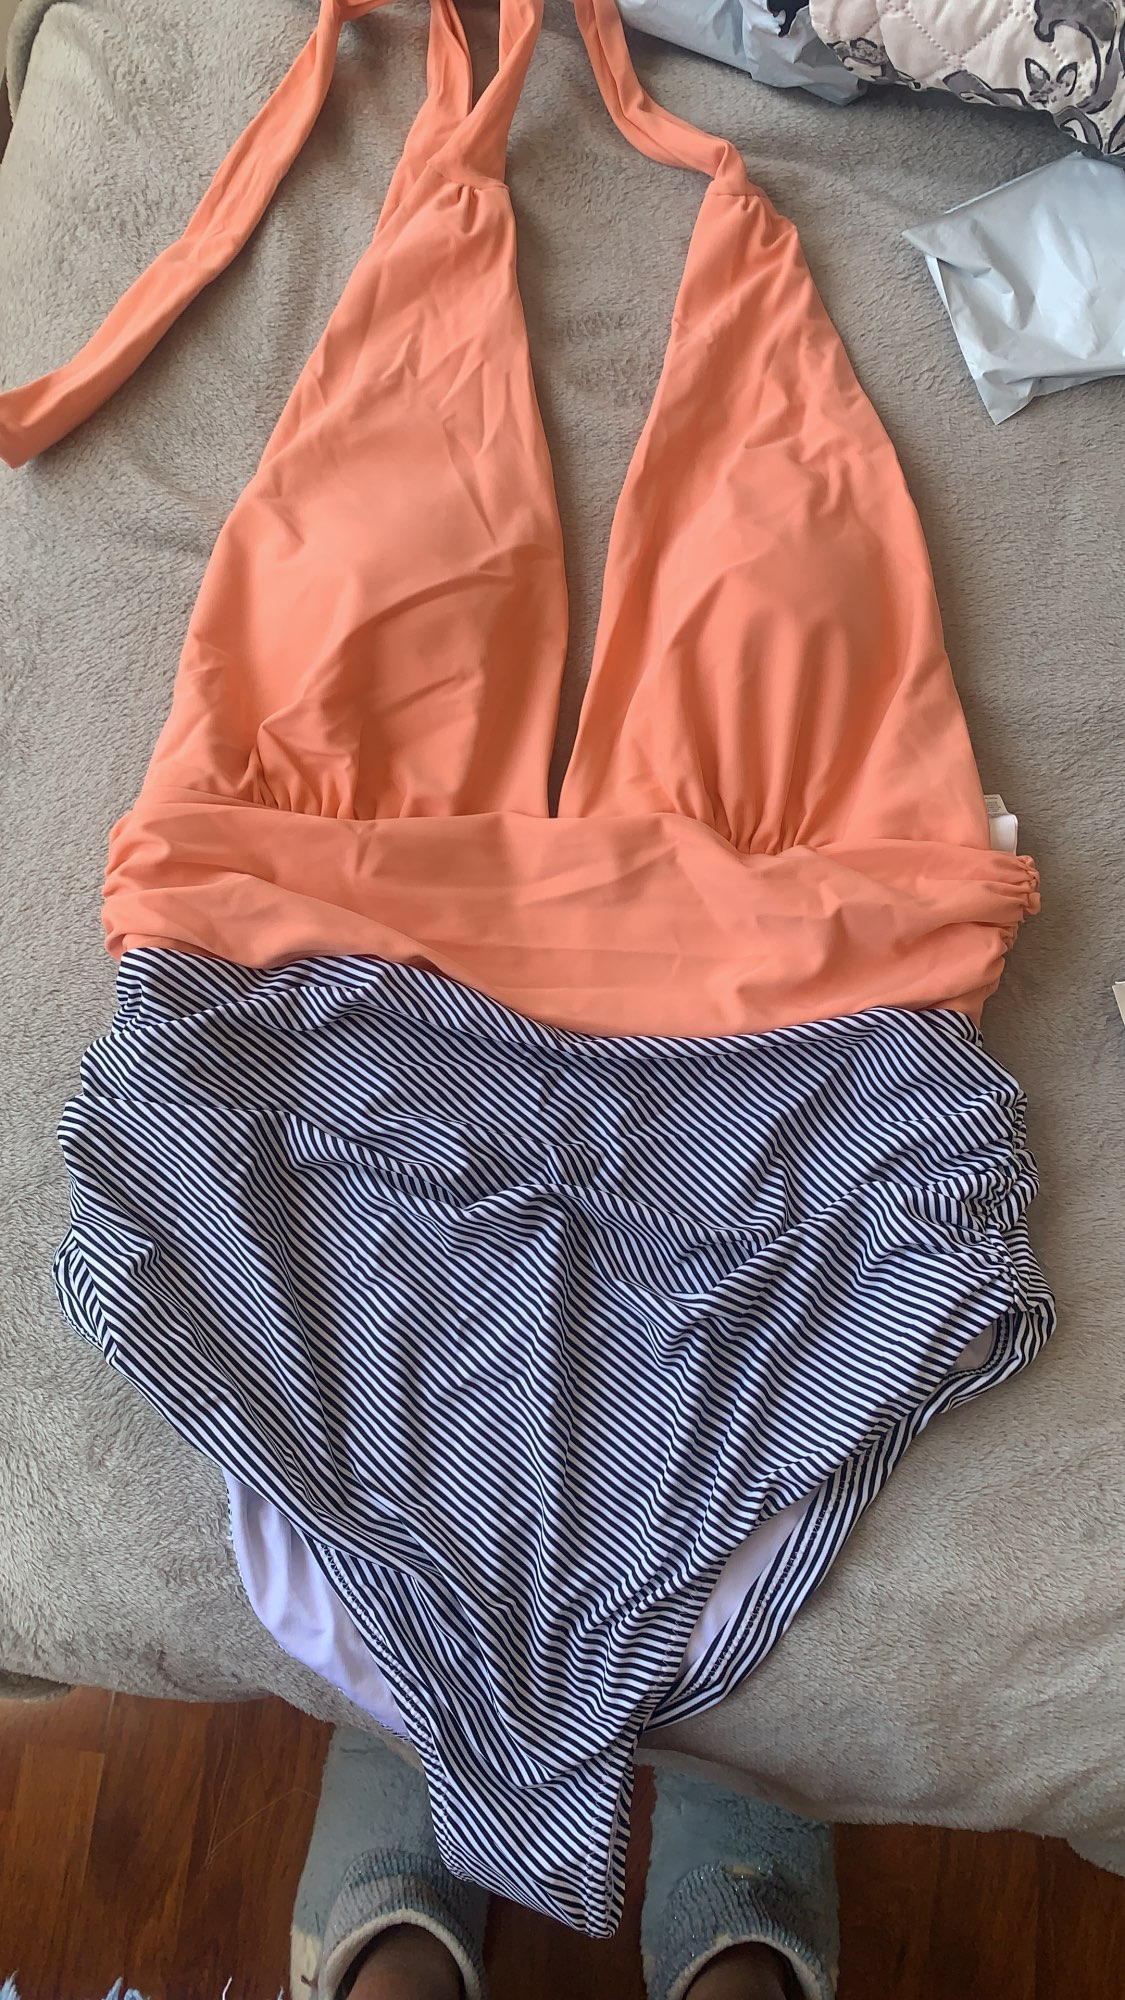 SEASELFIE Sexy Pink and Stripe Halter Deep V neck One Piece Swimsuit Women Padded Monokini 2021 Beach Bathing Suit Swimwear|Body Suits|   - AliExpress